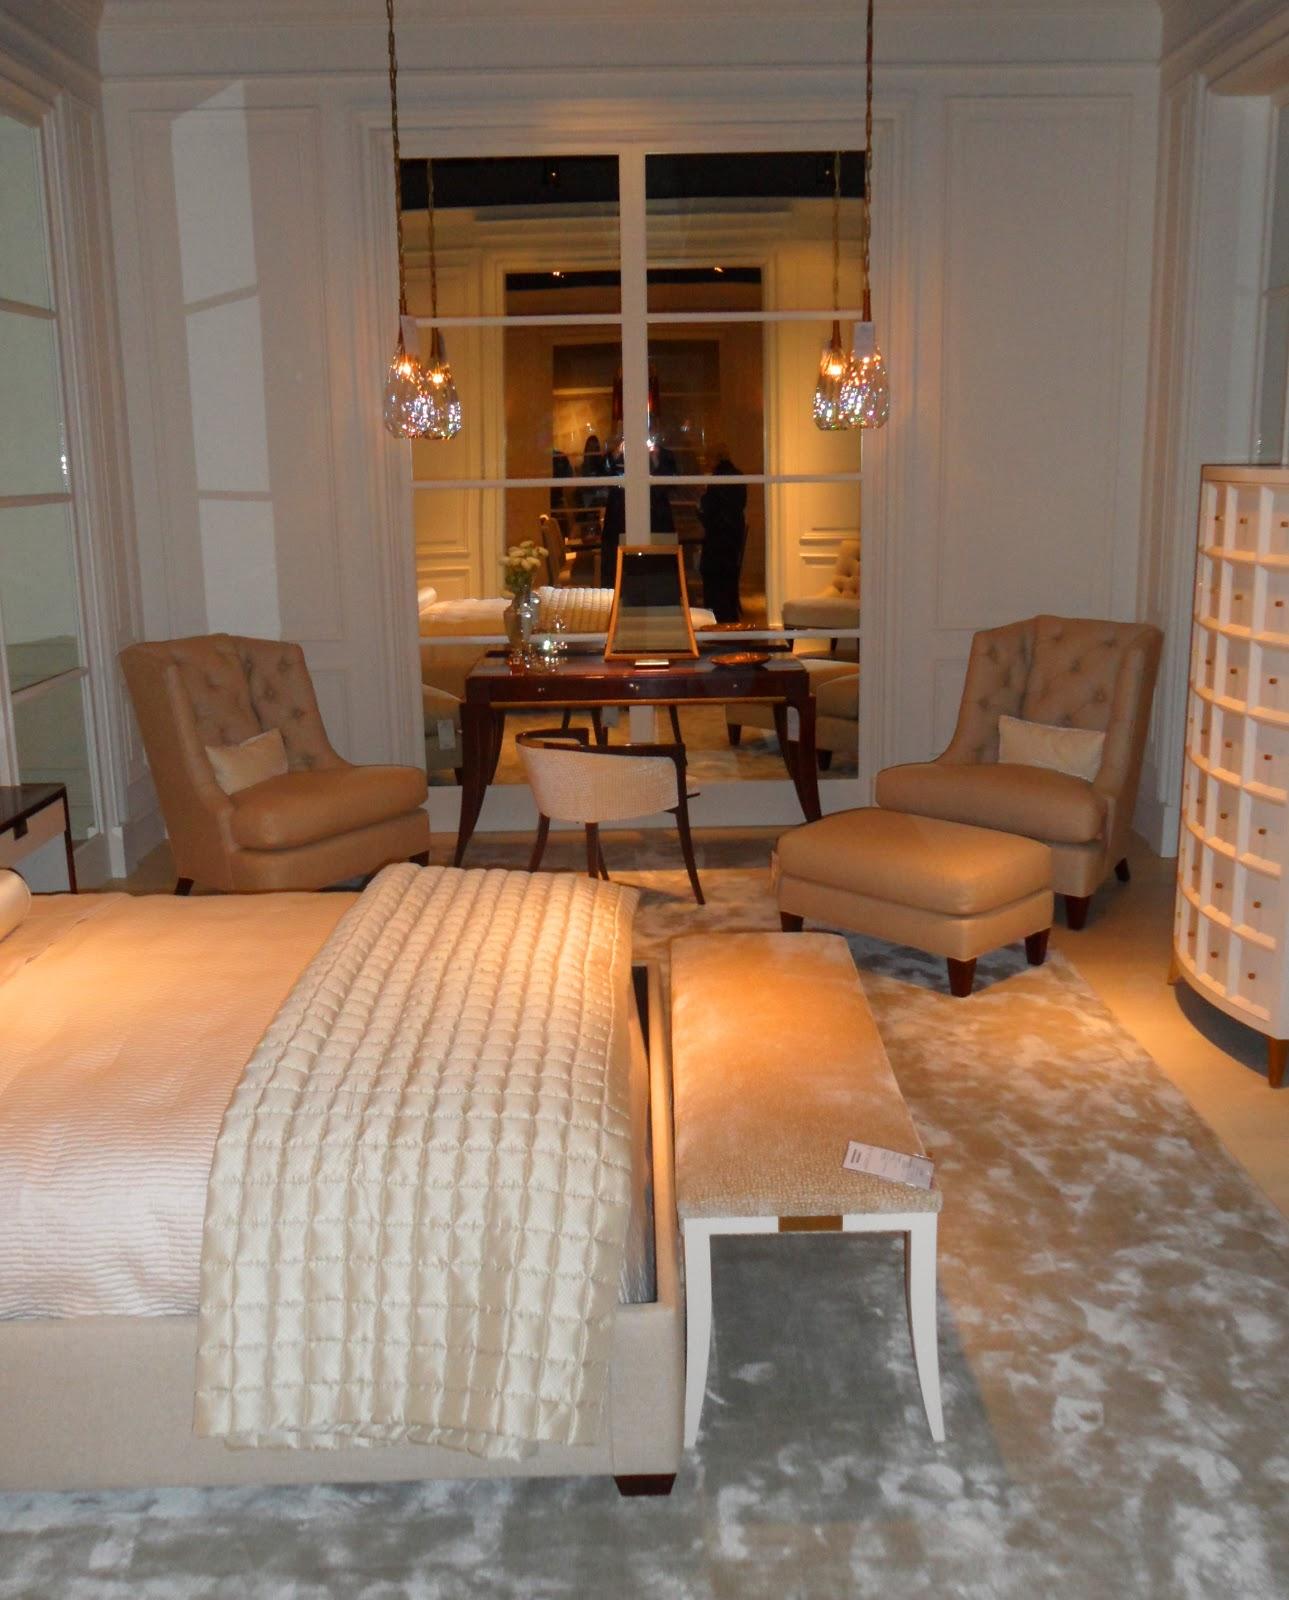 High Design Furniture: Design Guy: HIGH POINT FURNITURE MARKET, HIGH POINT, NC: Day 2